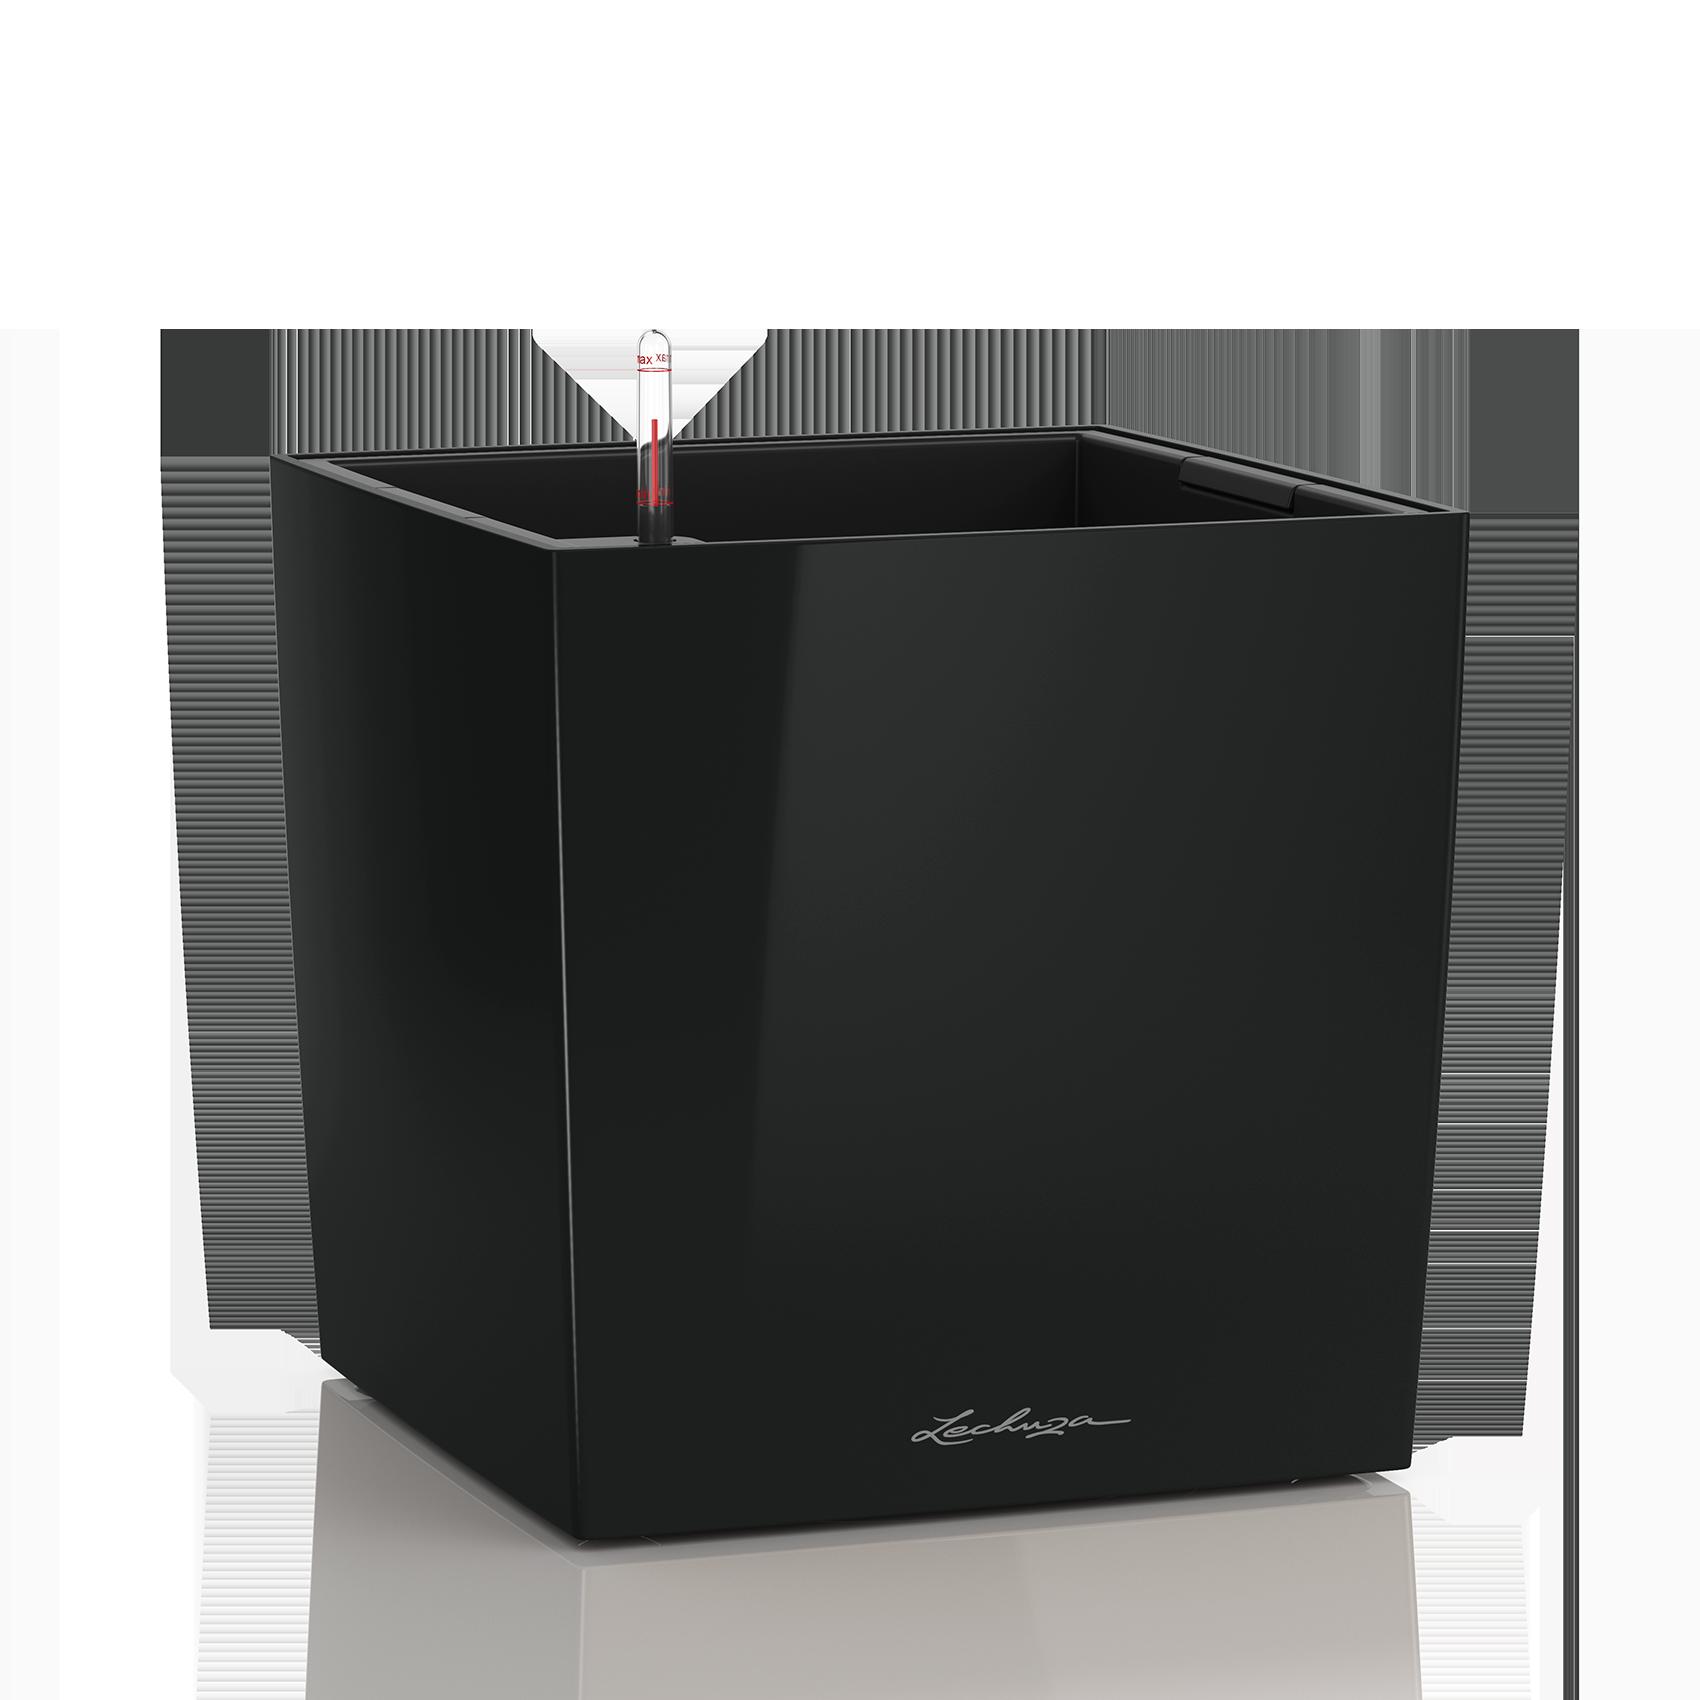 CUBE 40 black high-gloss